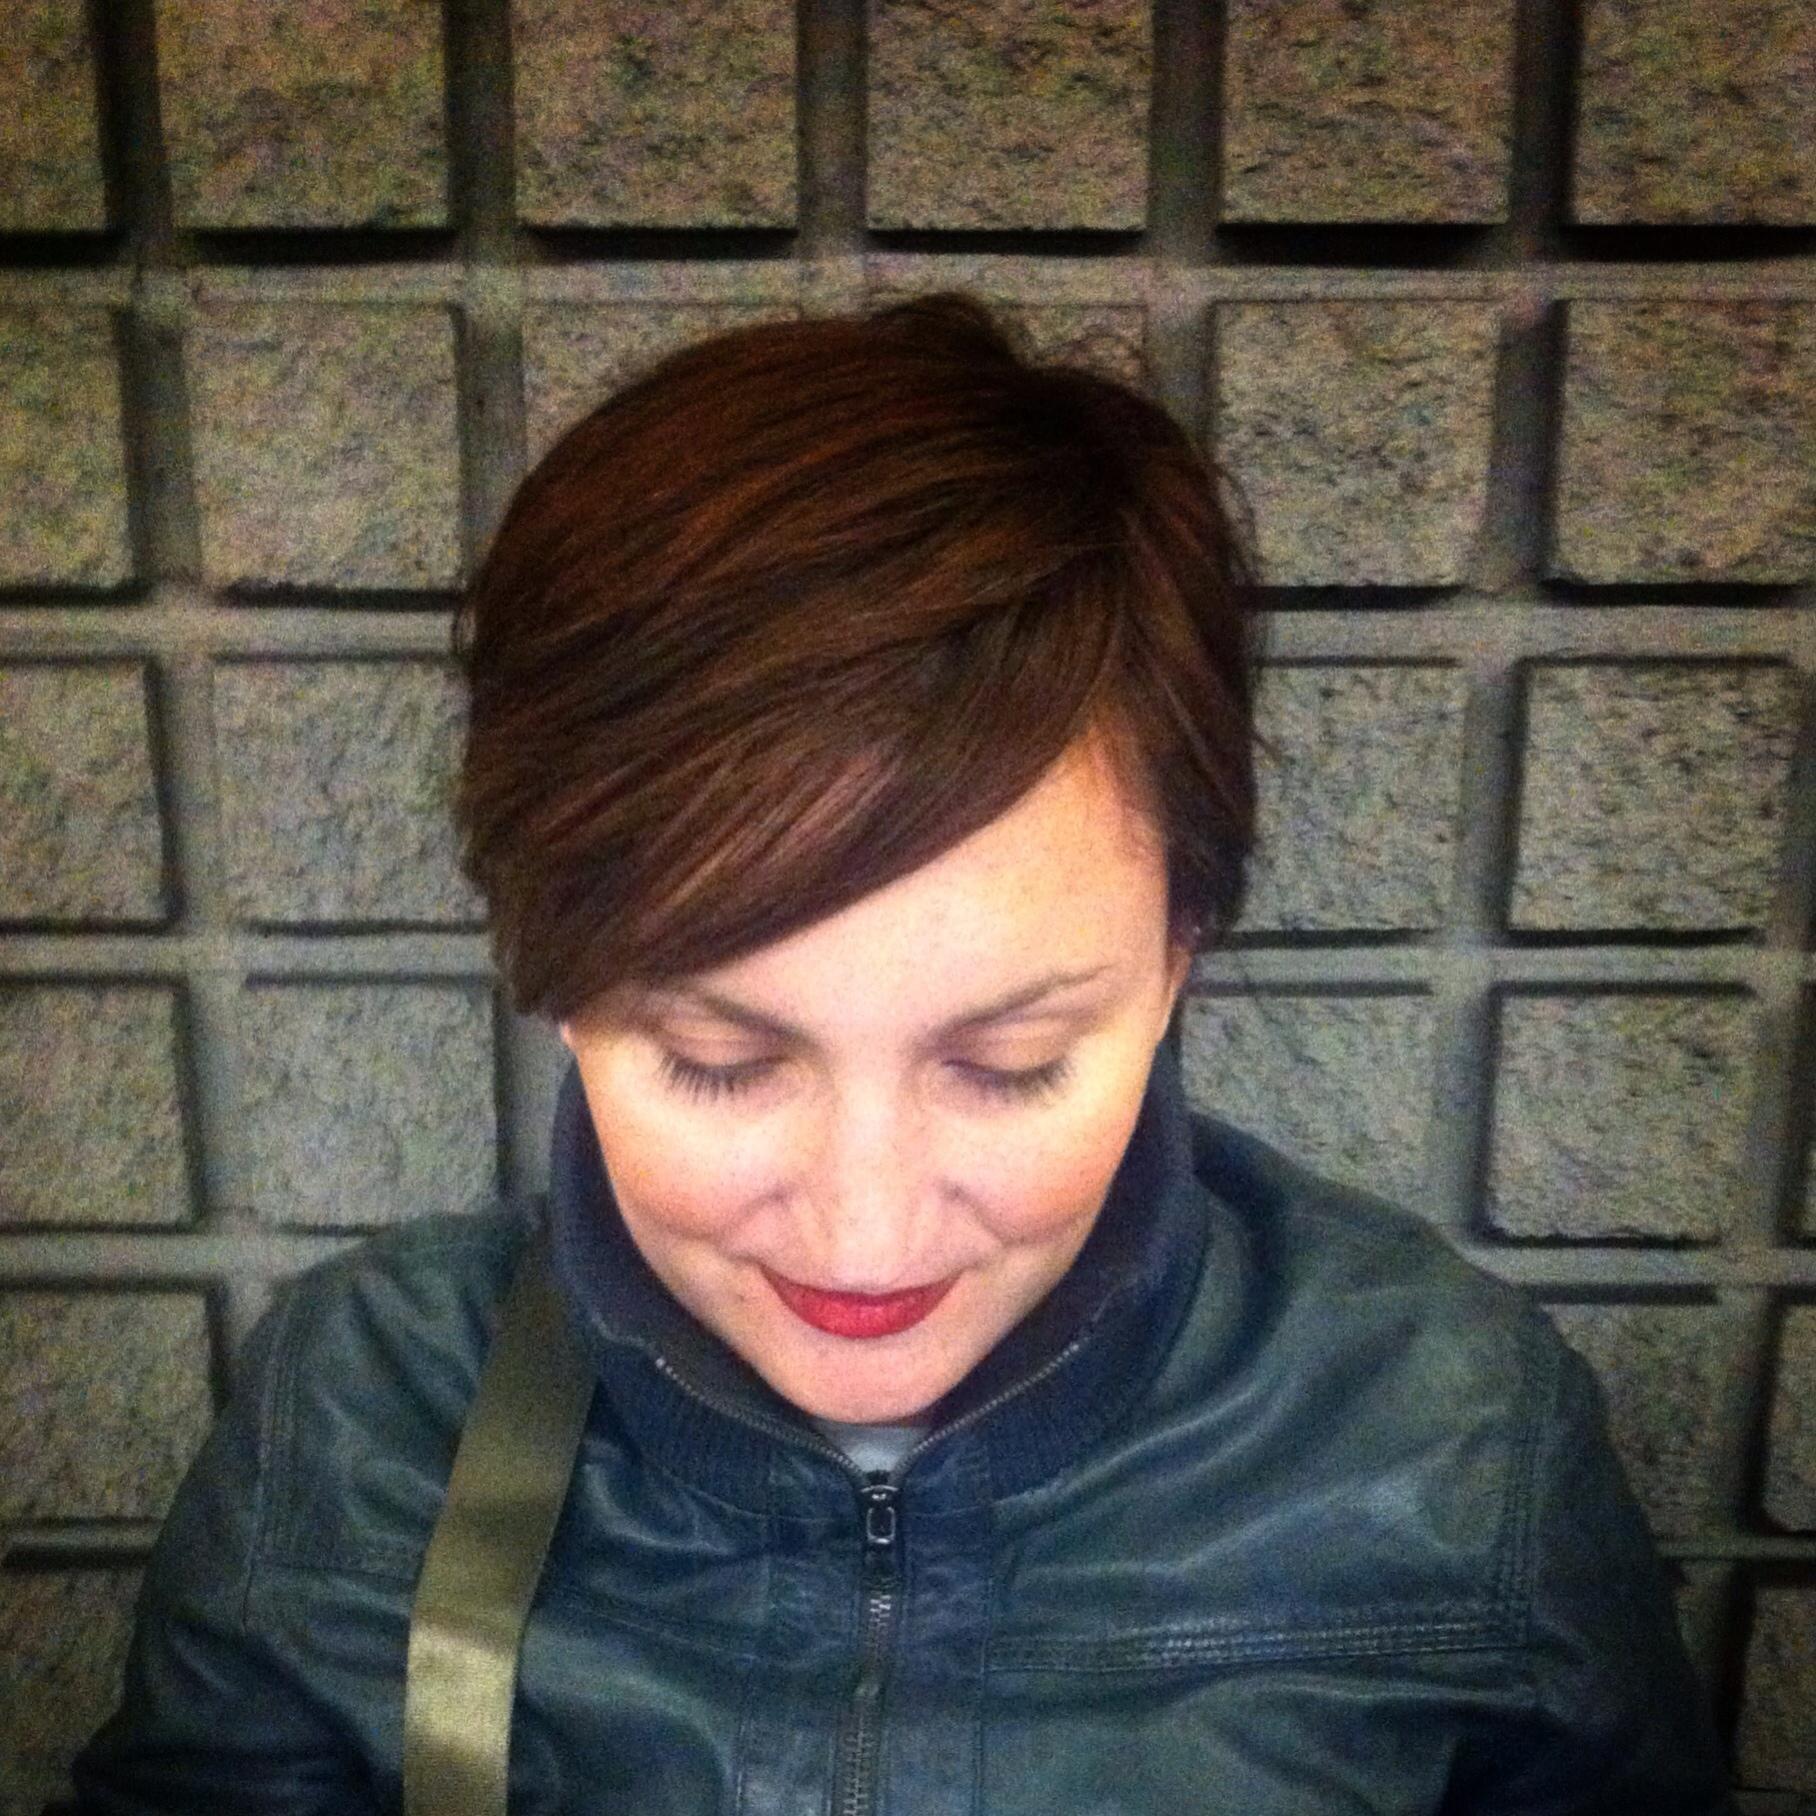 Marzia Bellini @milkydrop